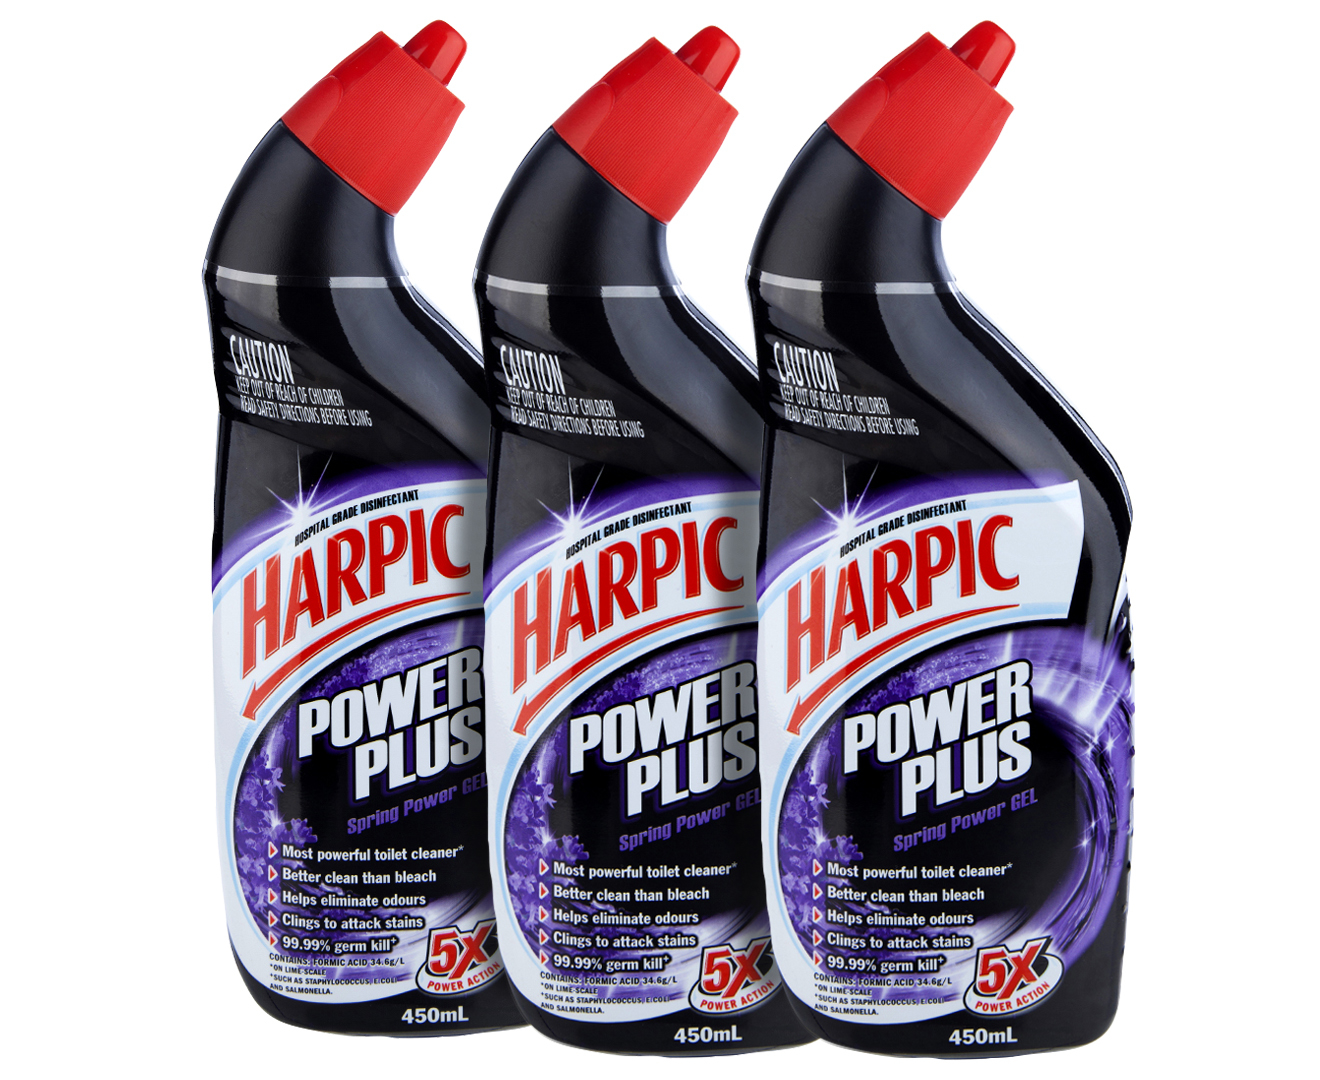 3 x Harpic Power Plus Spring Power Gel Toilet Cleaner 450mL ...